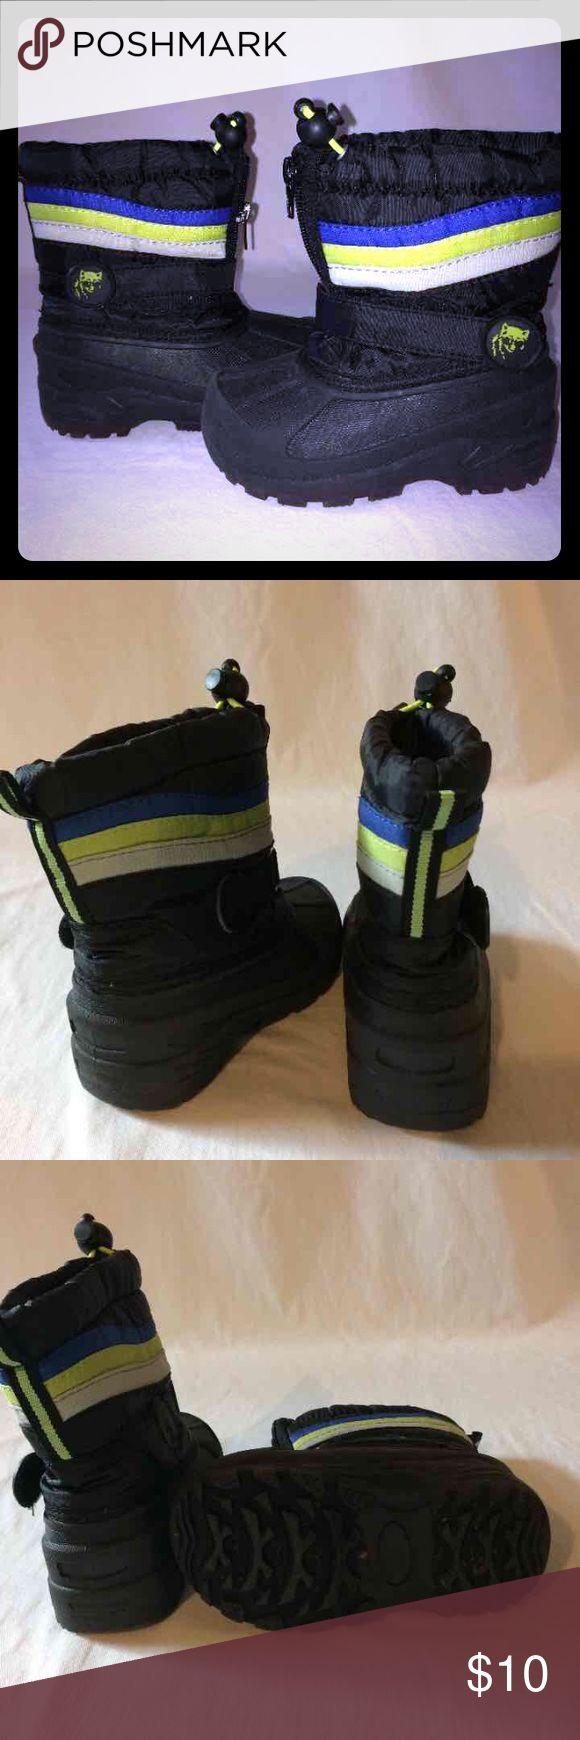 Boys winter boots boys winter boots size 7 black green blue